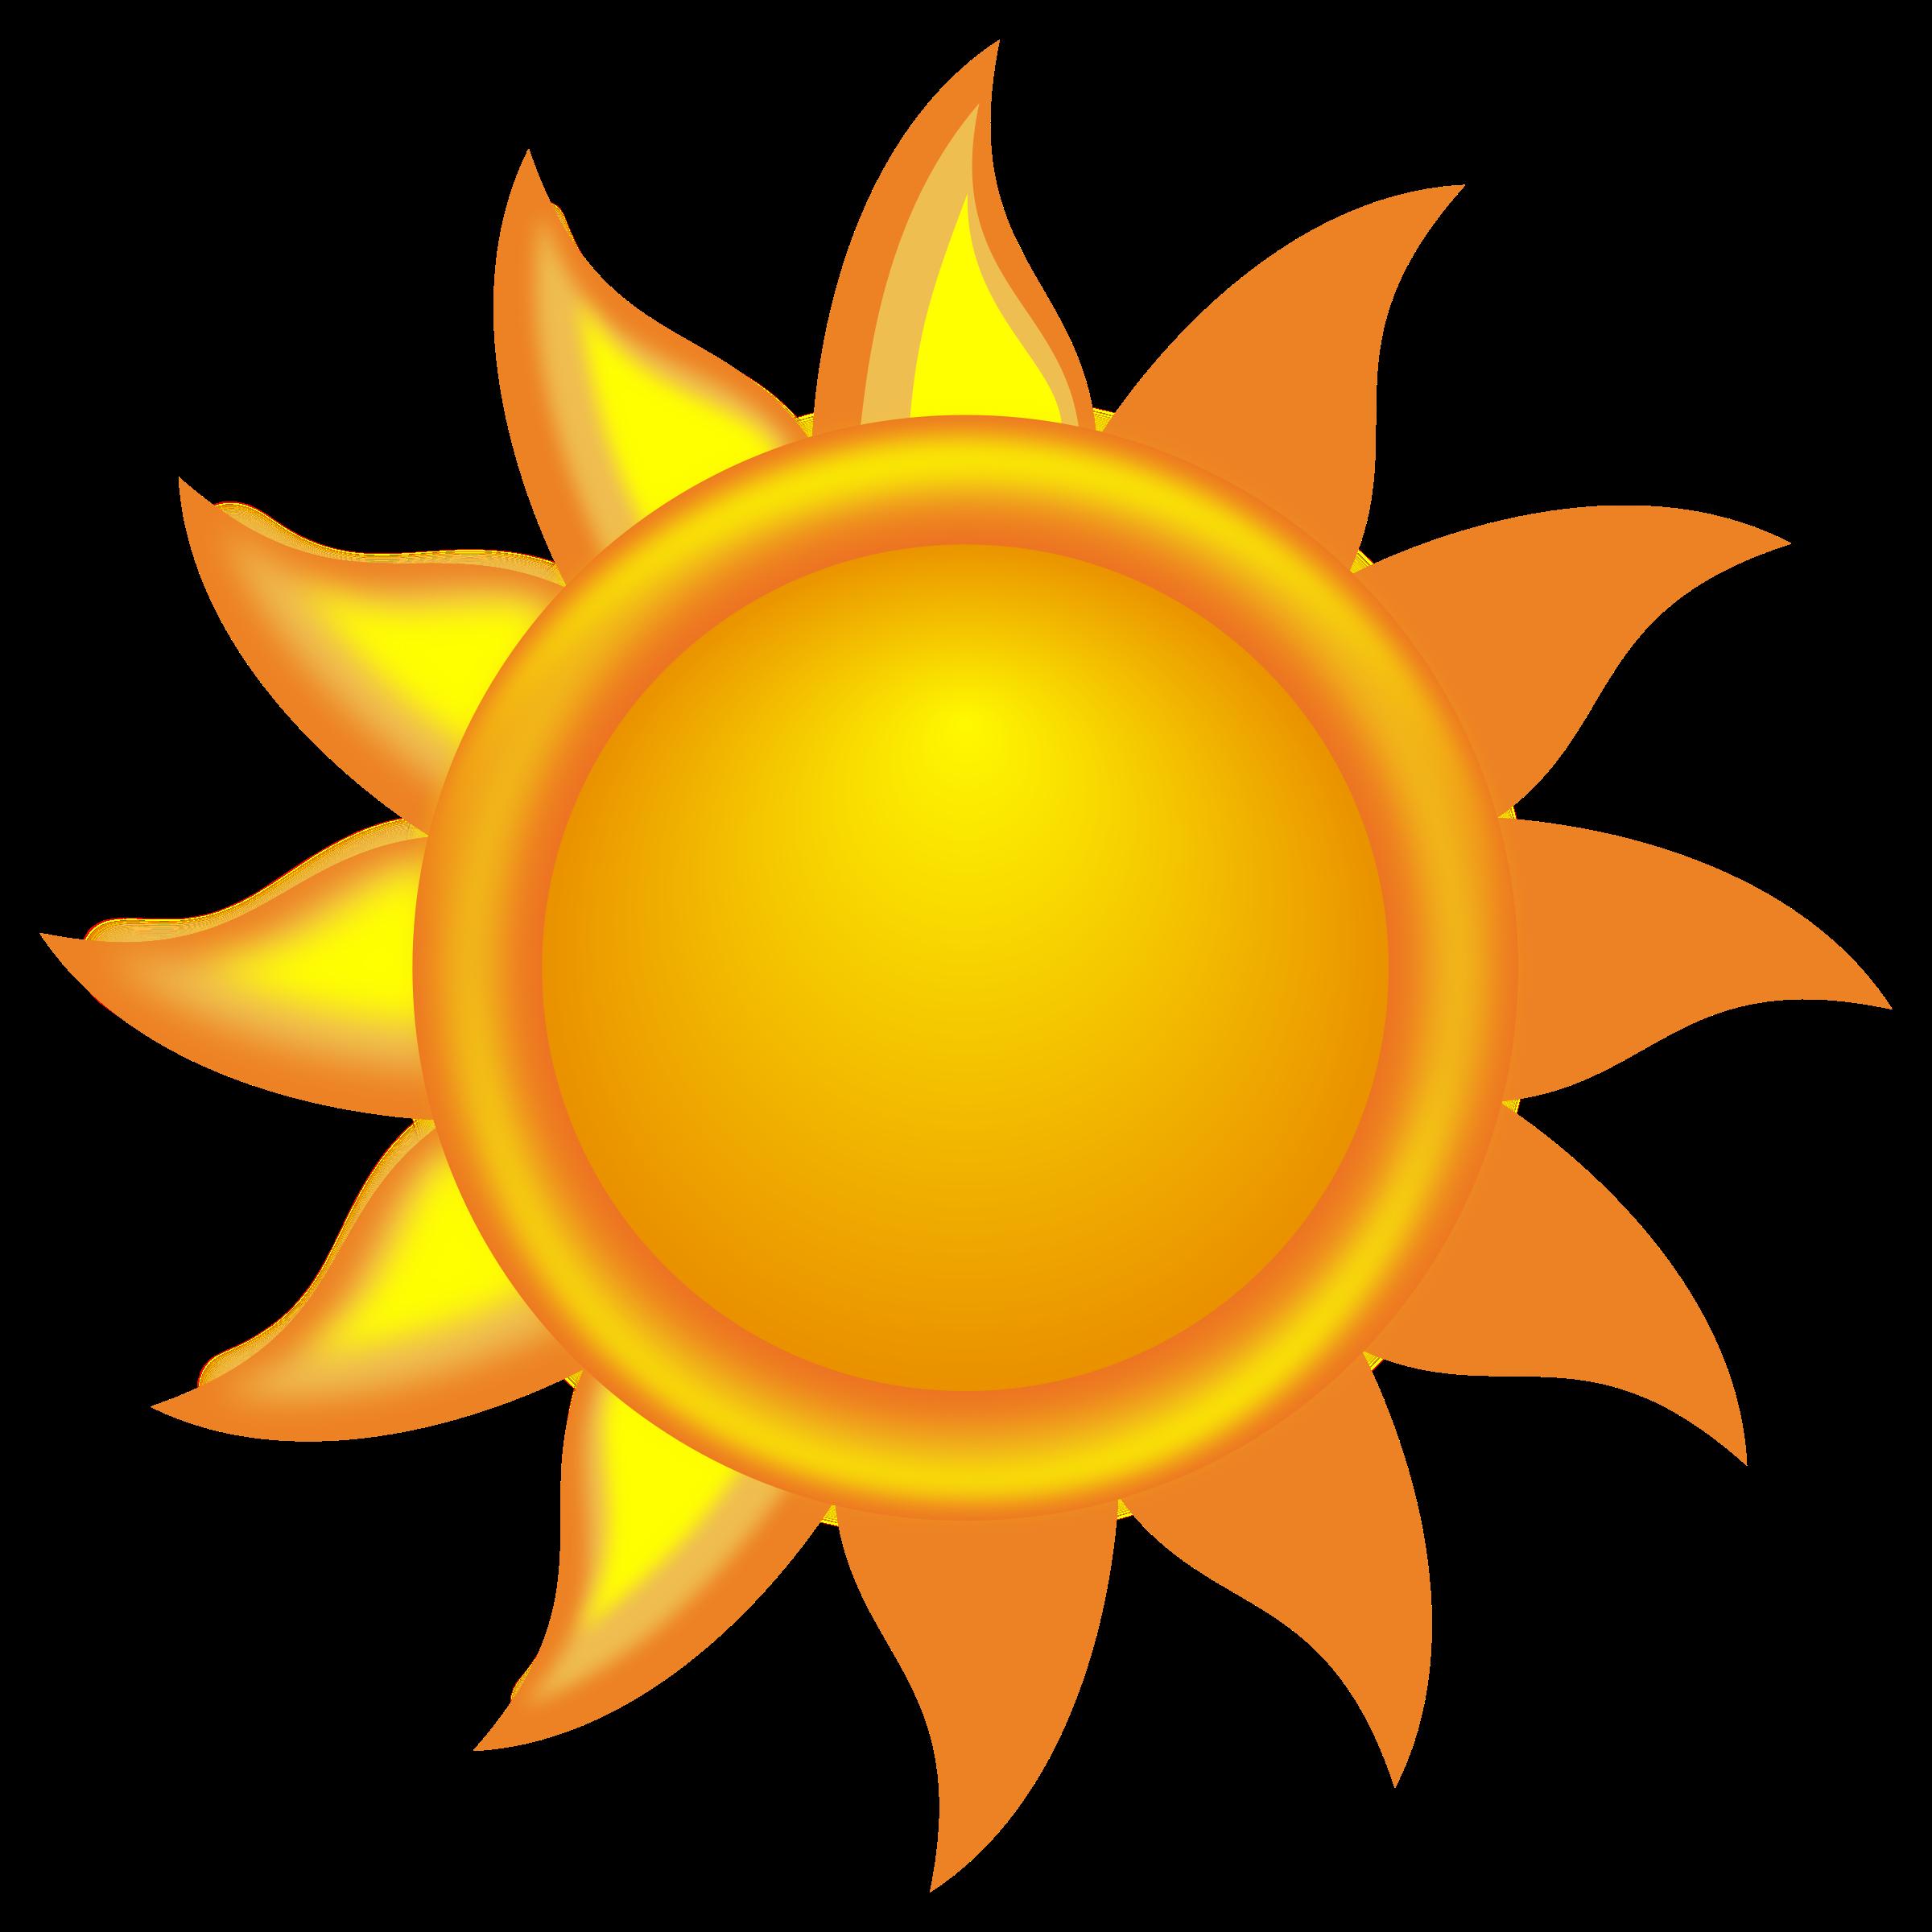 Sun HD PNG - 90312